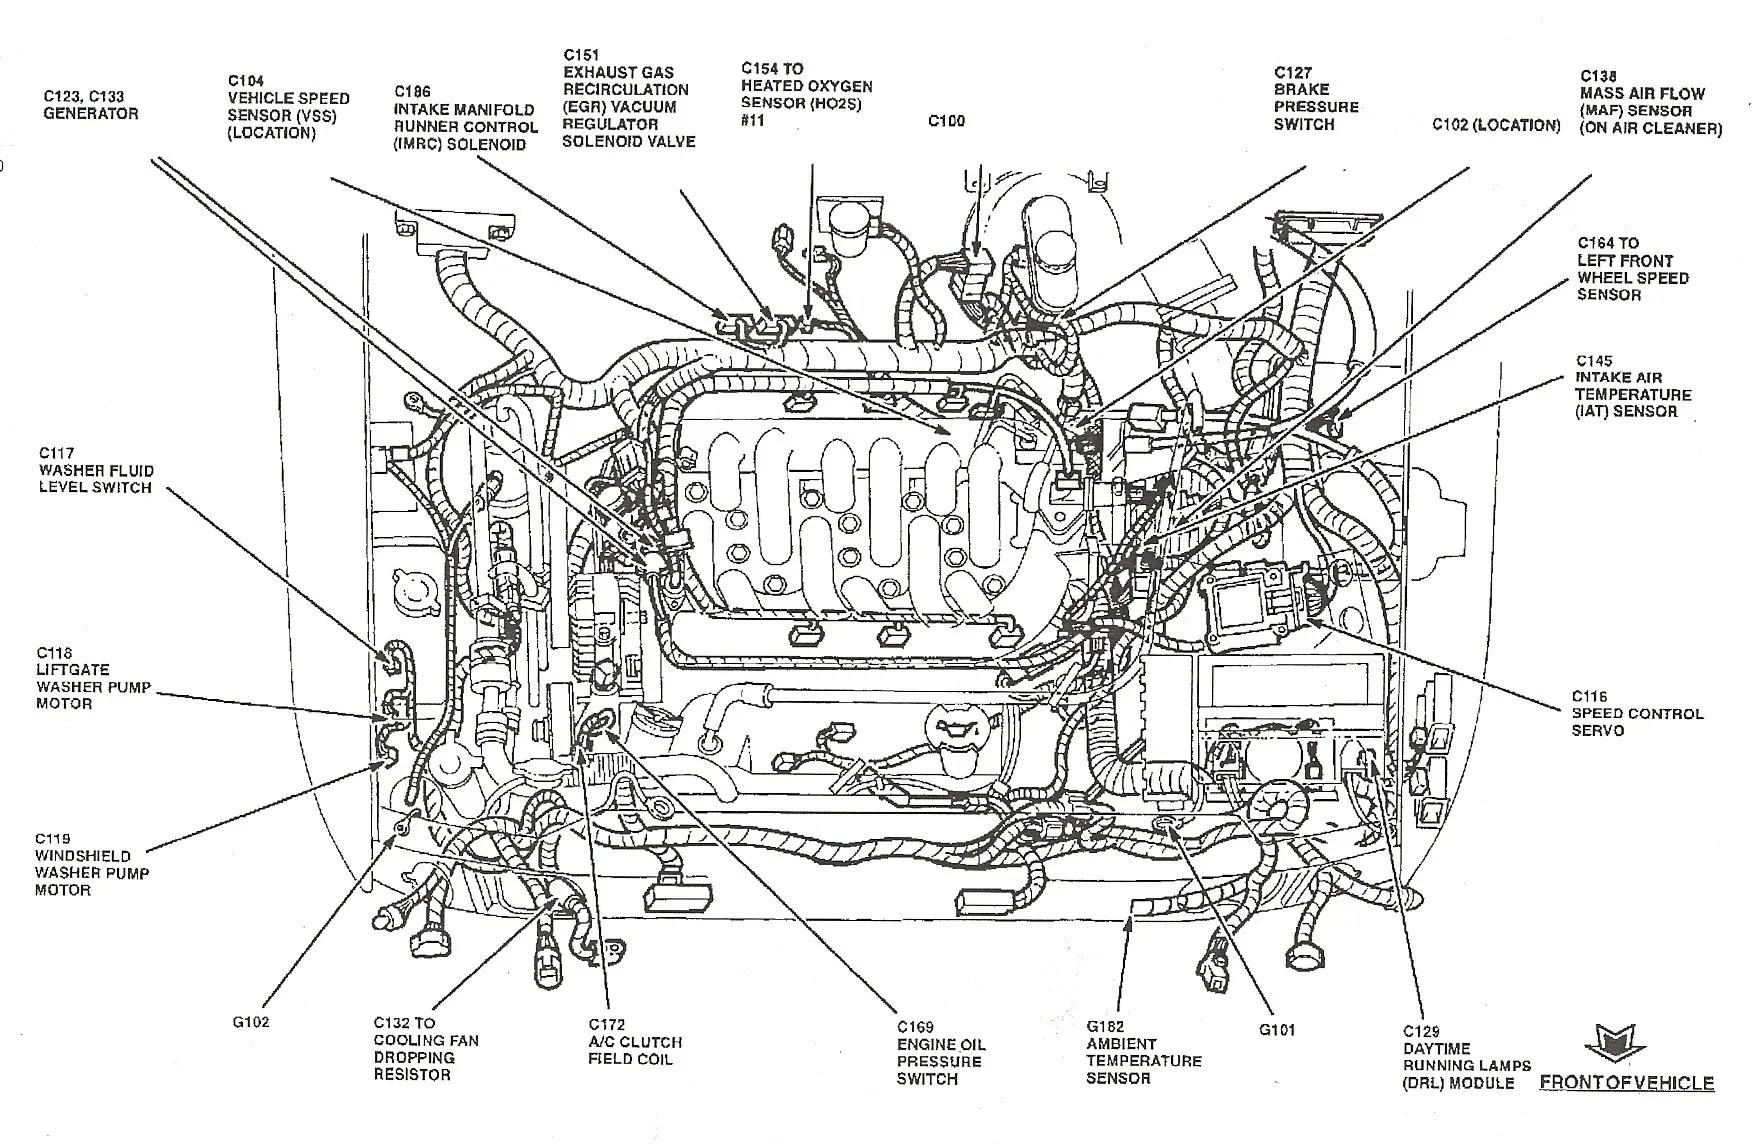 hight resolution of 1994 bmw 328i engine diagram wiring library rh 27 mac happen de 2000 bmw 328i engine diagram 2012 bmw 528i engine diagram